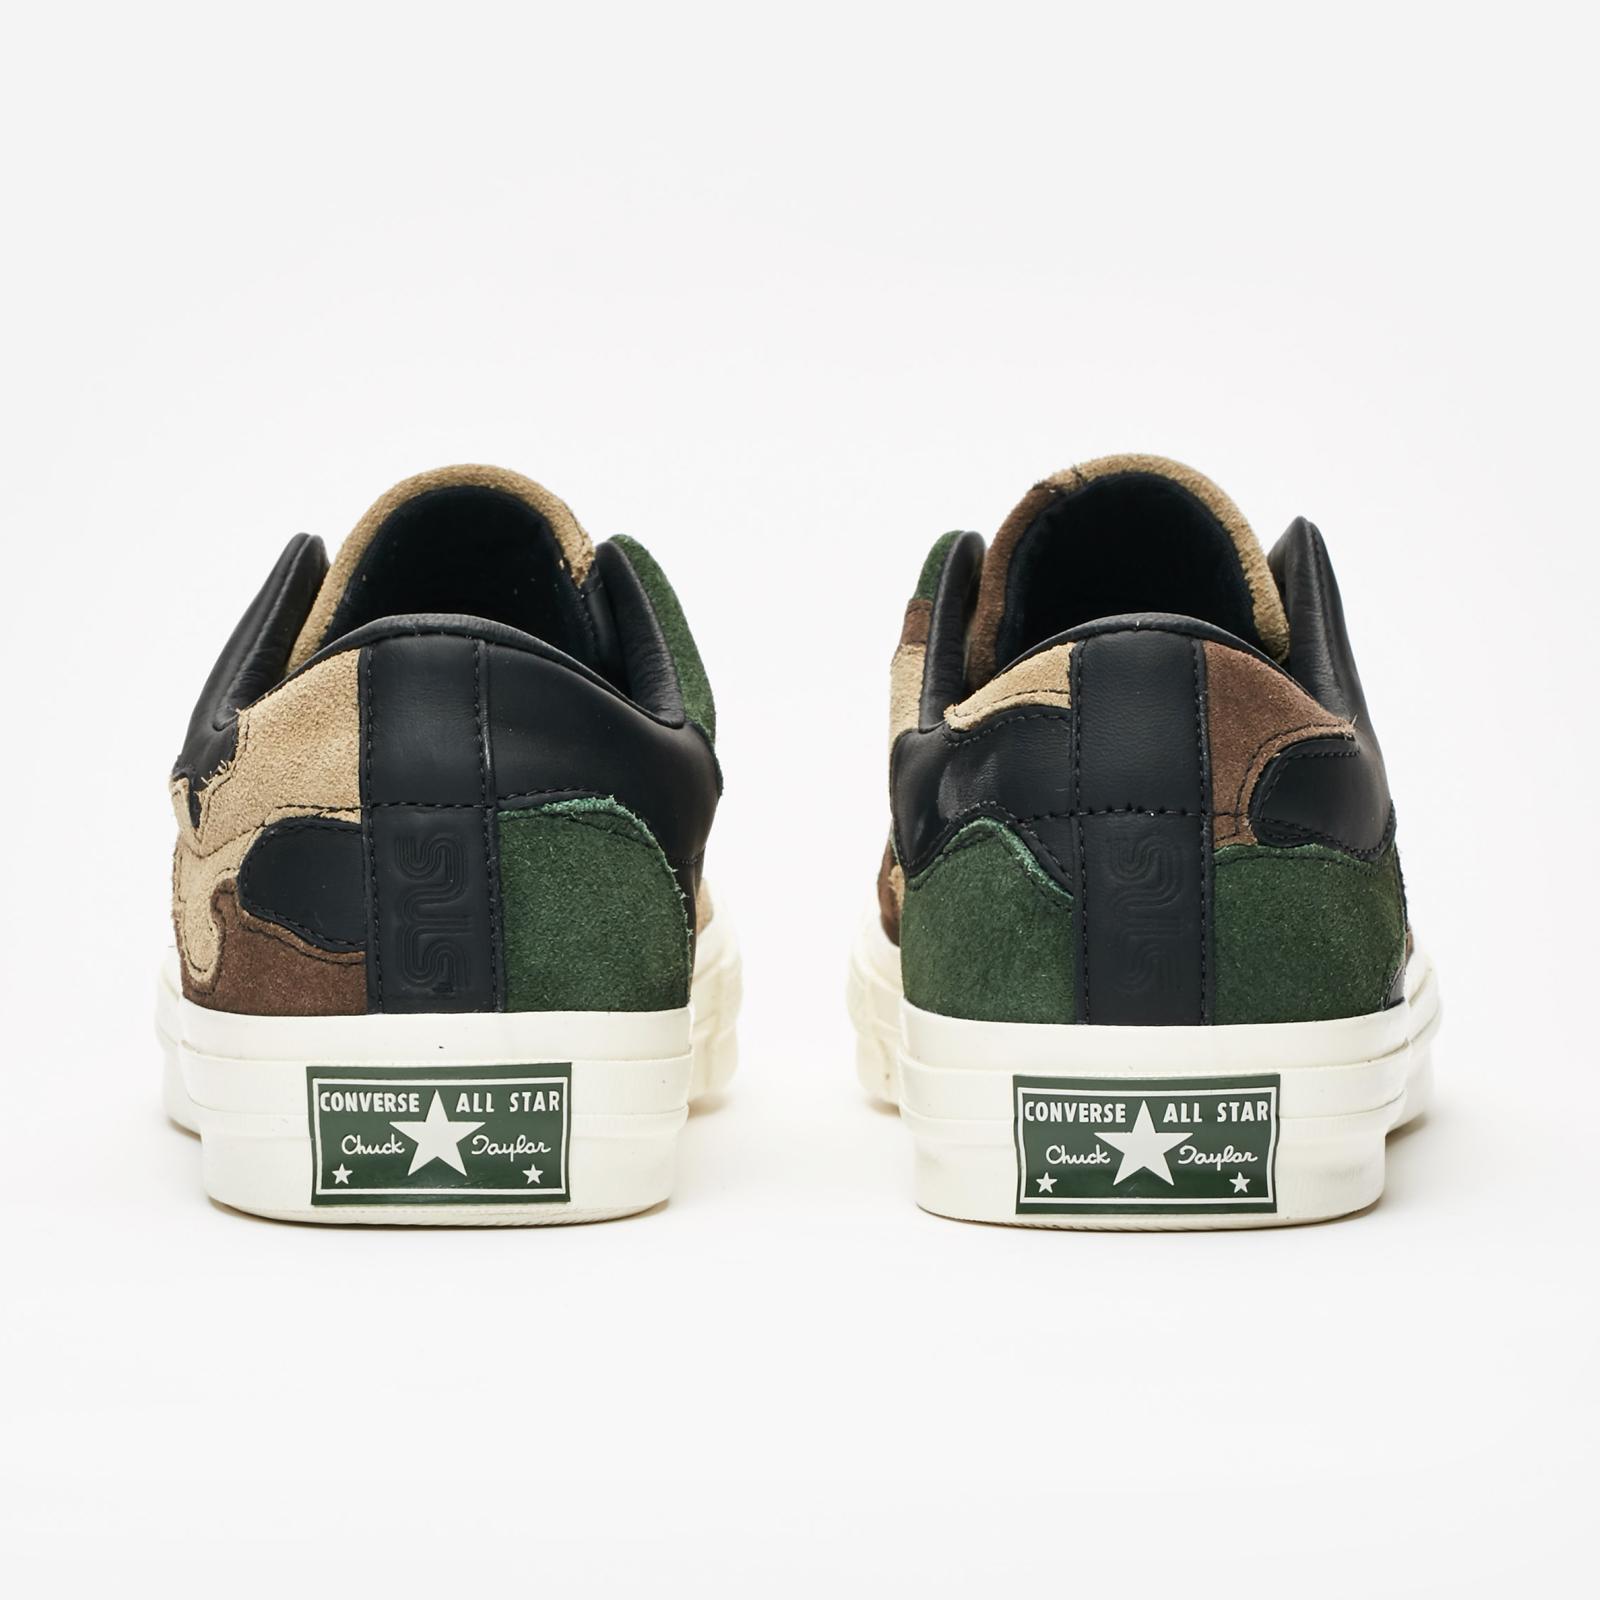 593e431fa4b3 Converse One Star x Sneakersnstuff - 161406c - Sneakersnstuff I ...